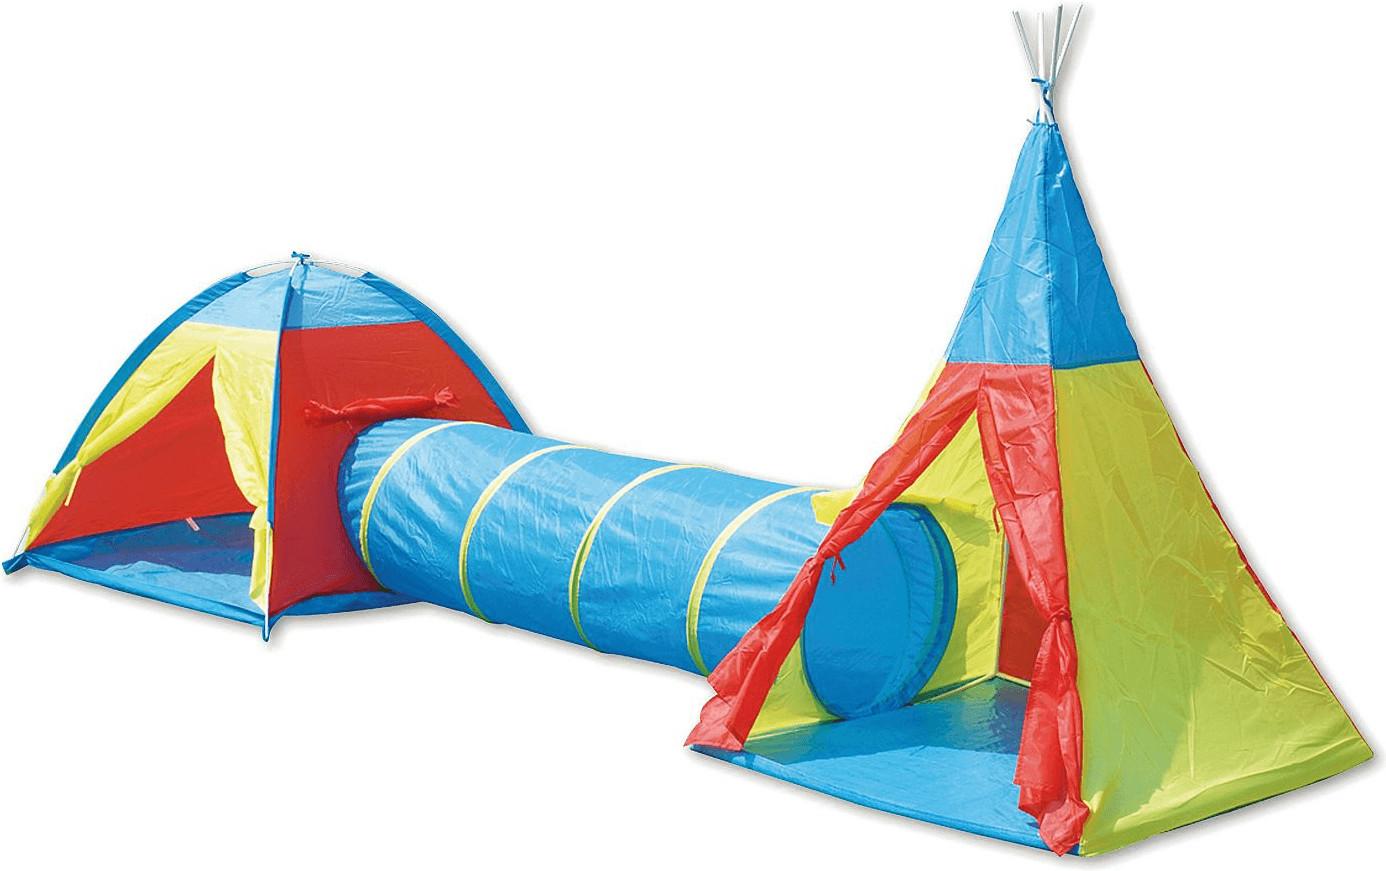 The Toy Company Abenteuerzelt mit Tunnel